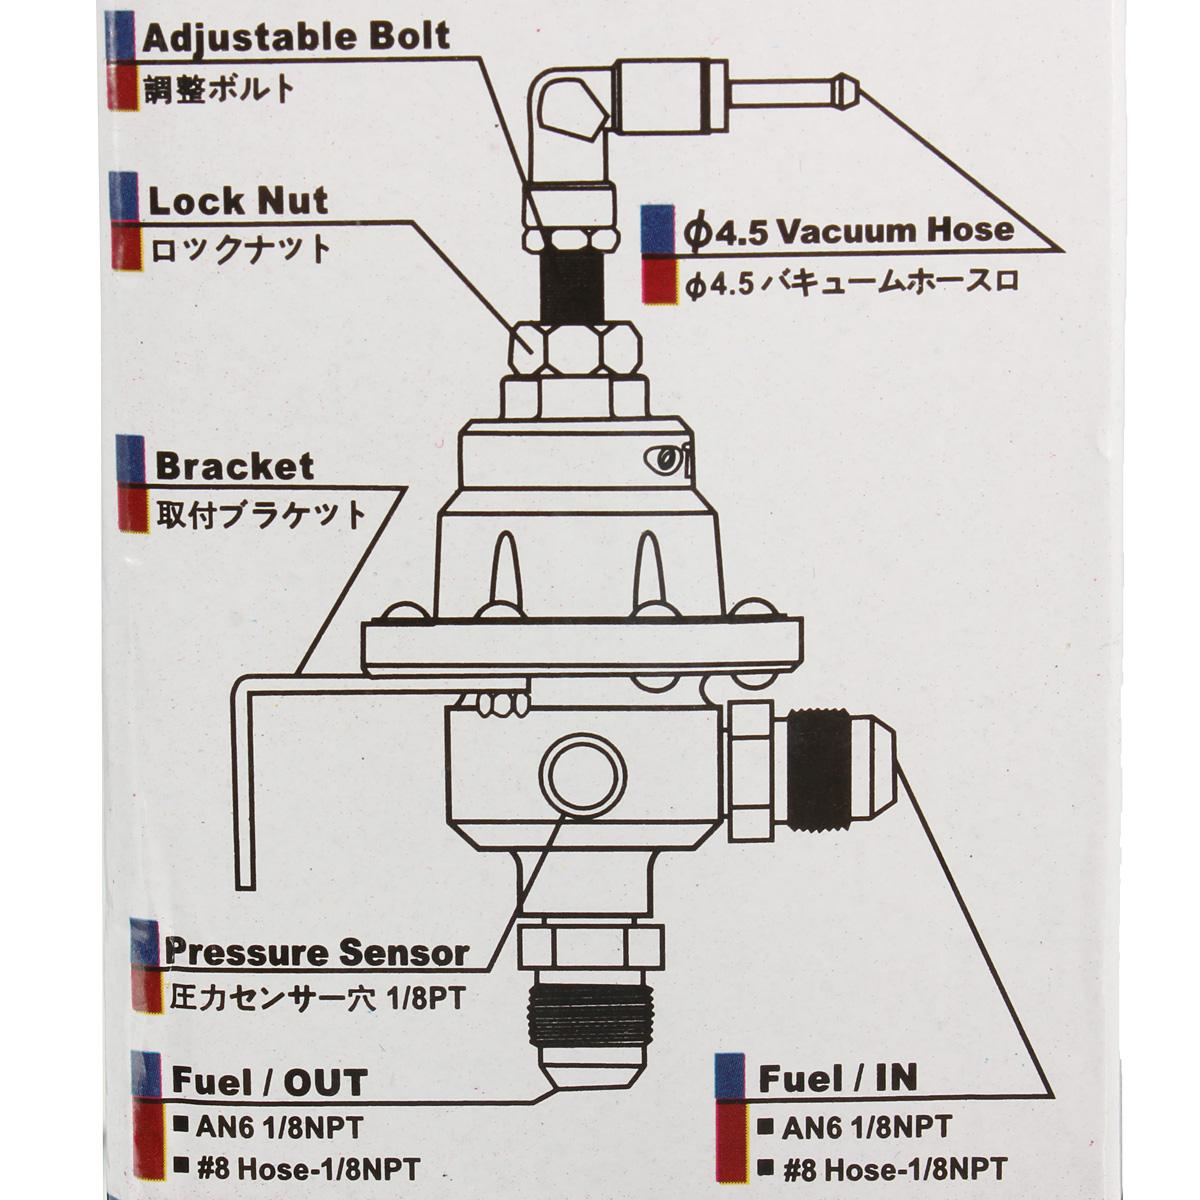 Free Shipping Flash Dealhot New Adjustable Fuel Pressure Regulator Diagram 16